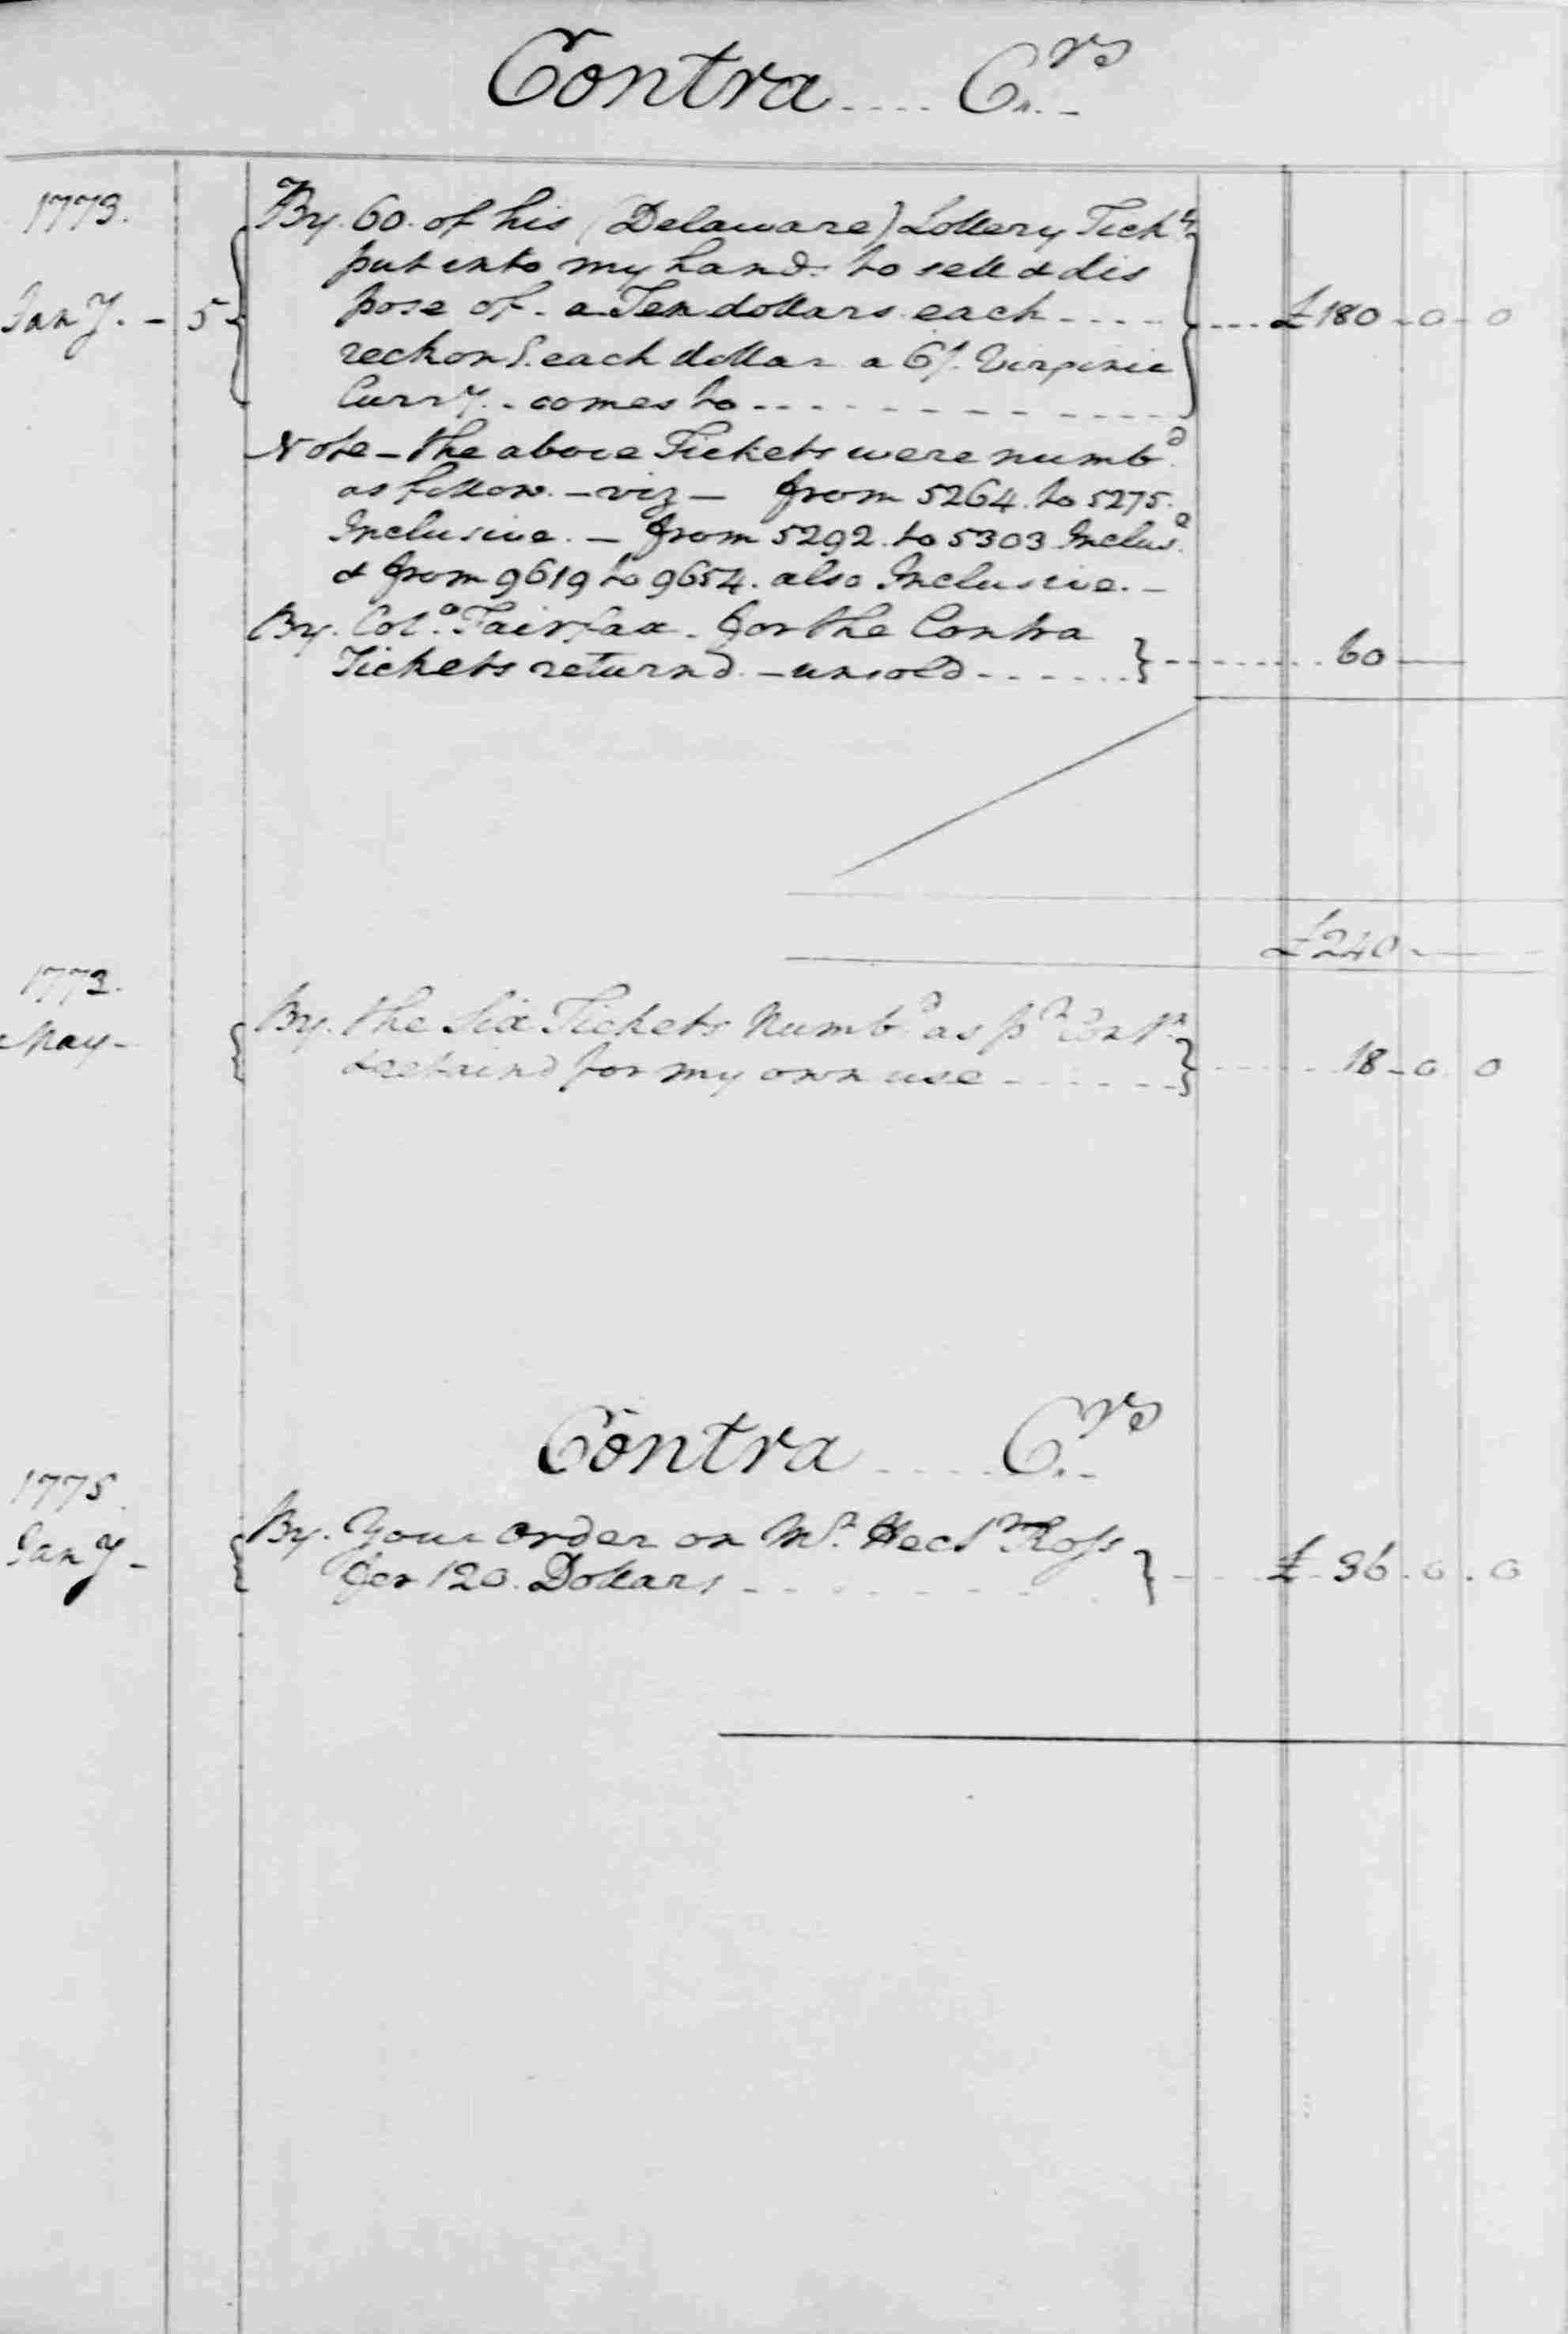 Ledger B, folio 83, right side